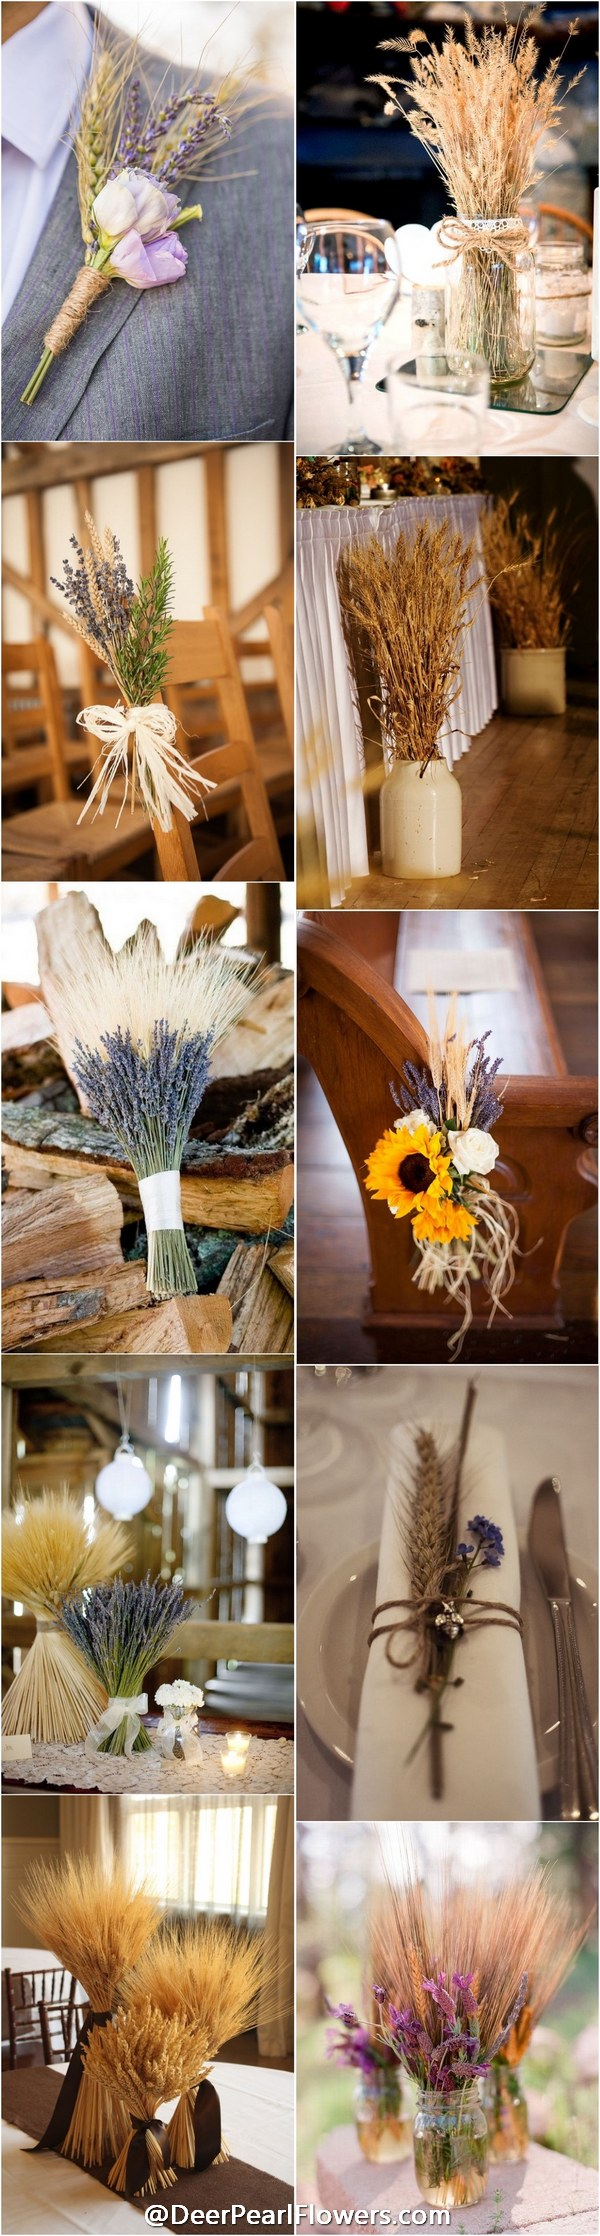 Fall wedding decor ideas   Fall Rustic Country Wheat Wedding Decor Ideas  Country fall